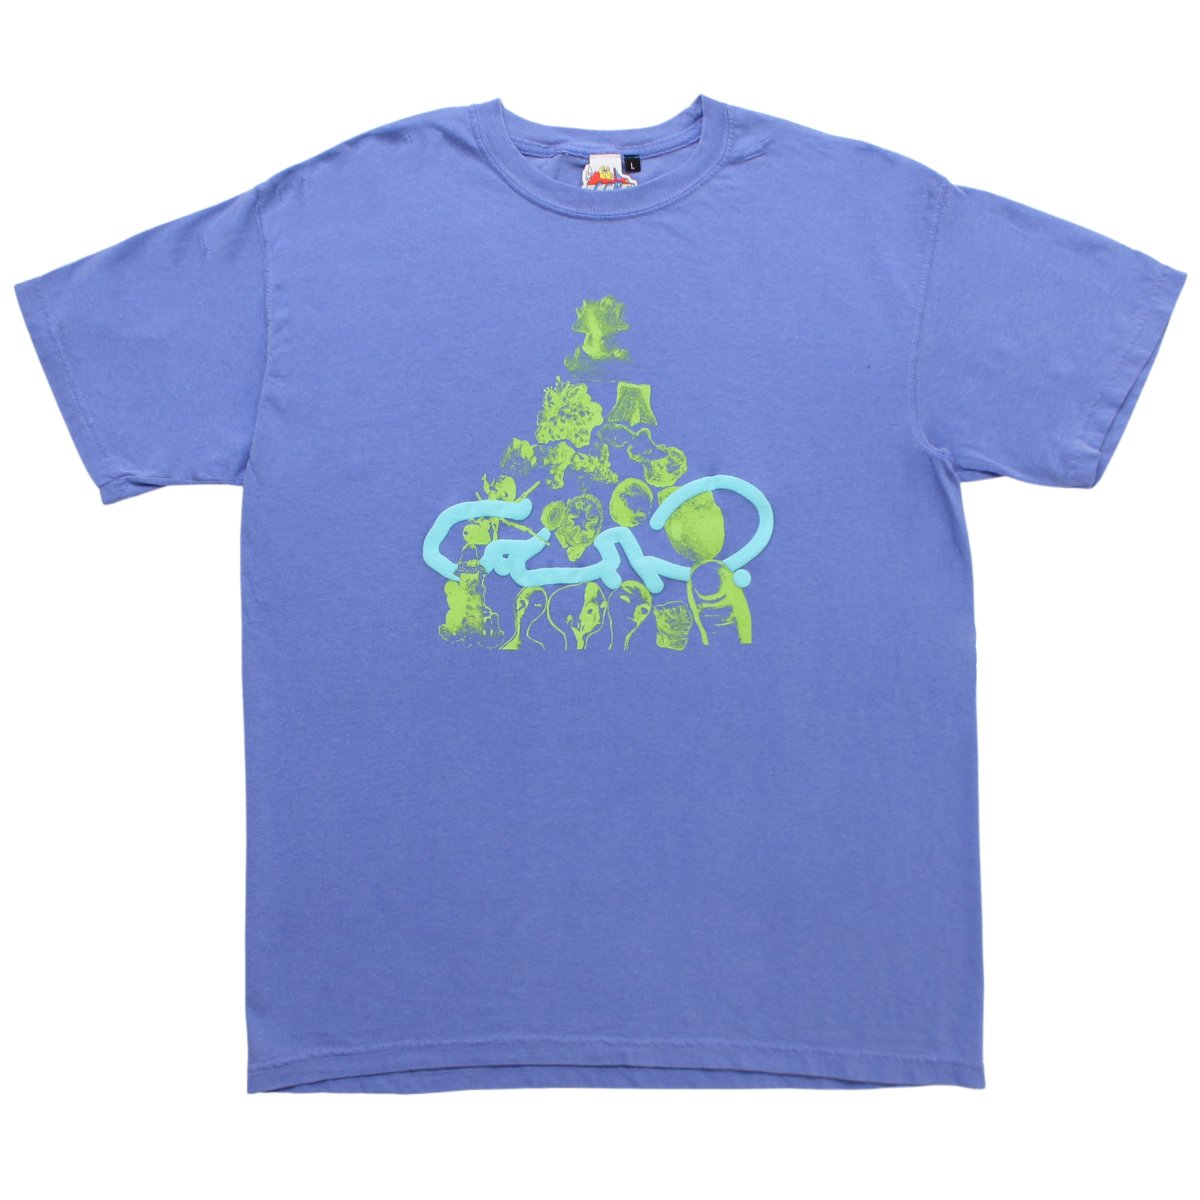 Ed Davis x BIEN T-shirt【FLOW BLUE】